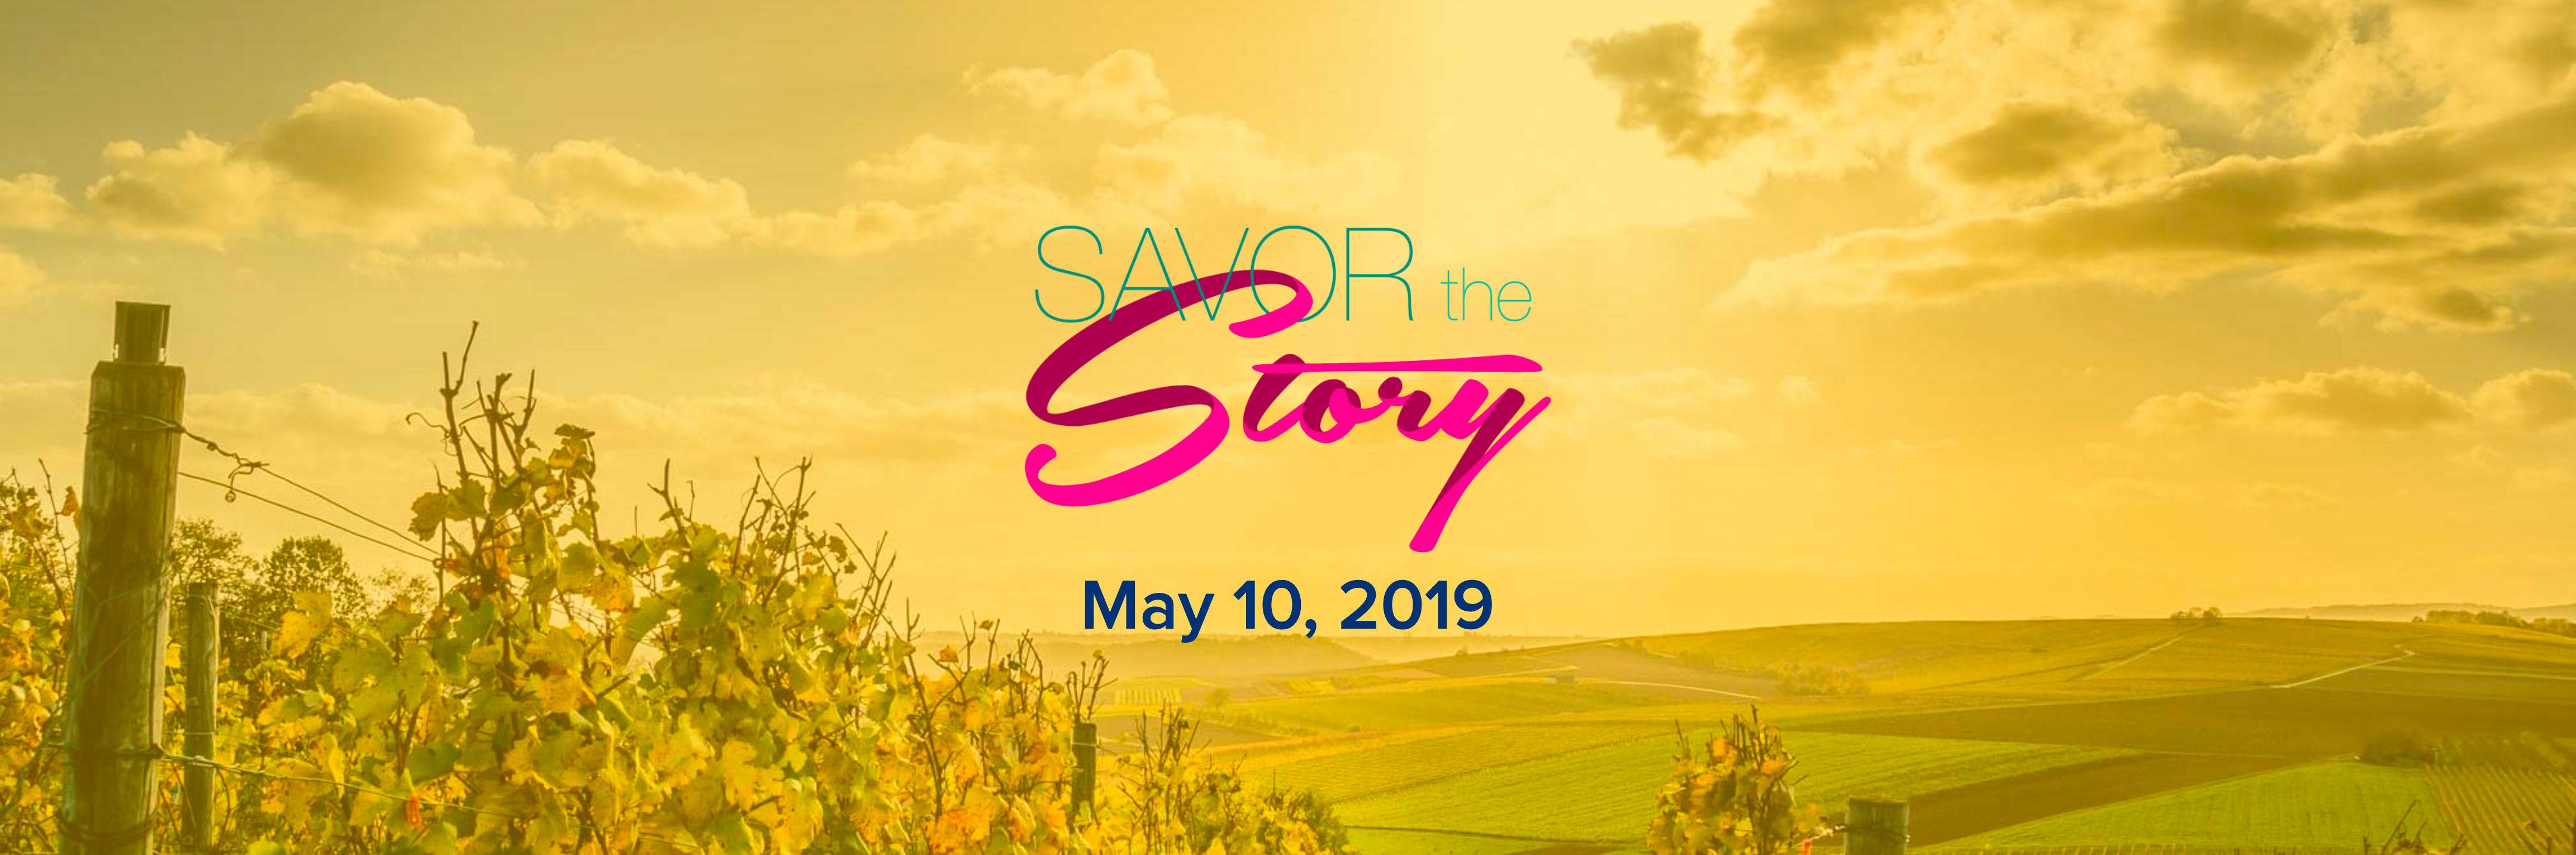 Savor The Story Toast Header